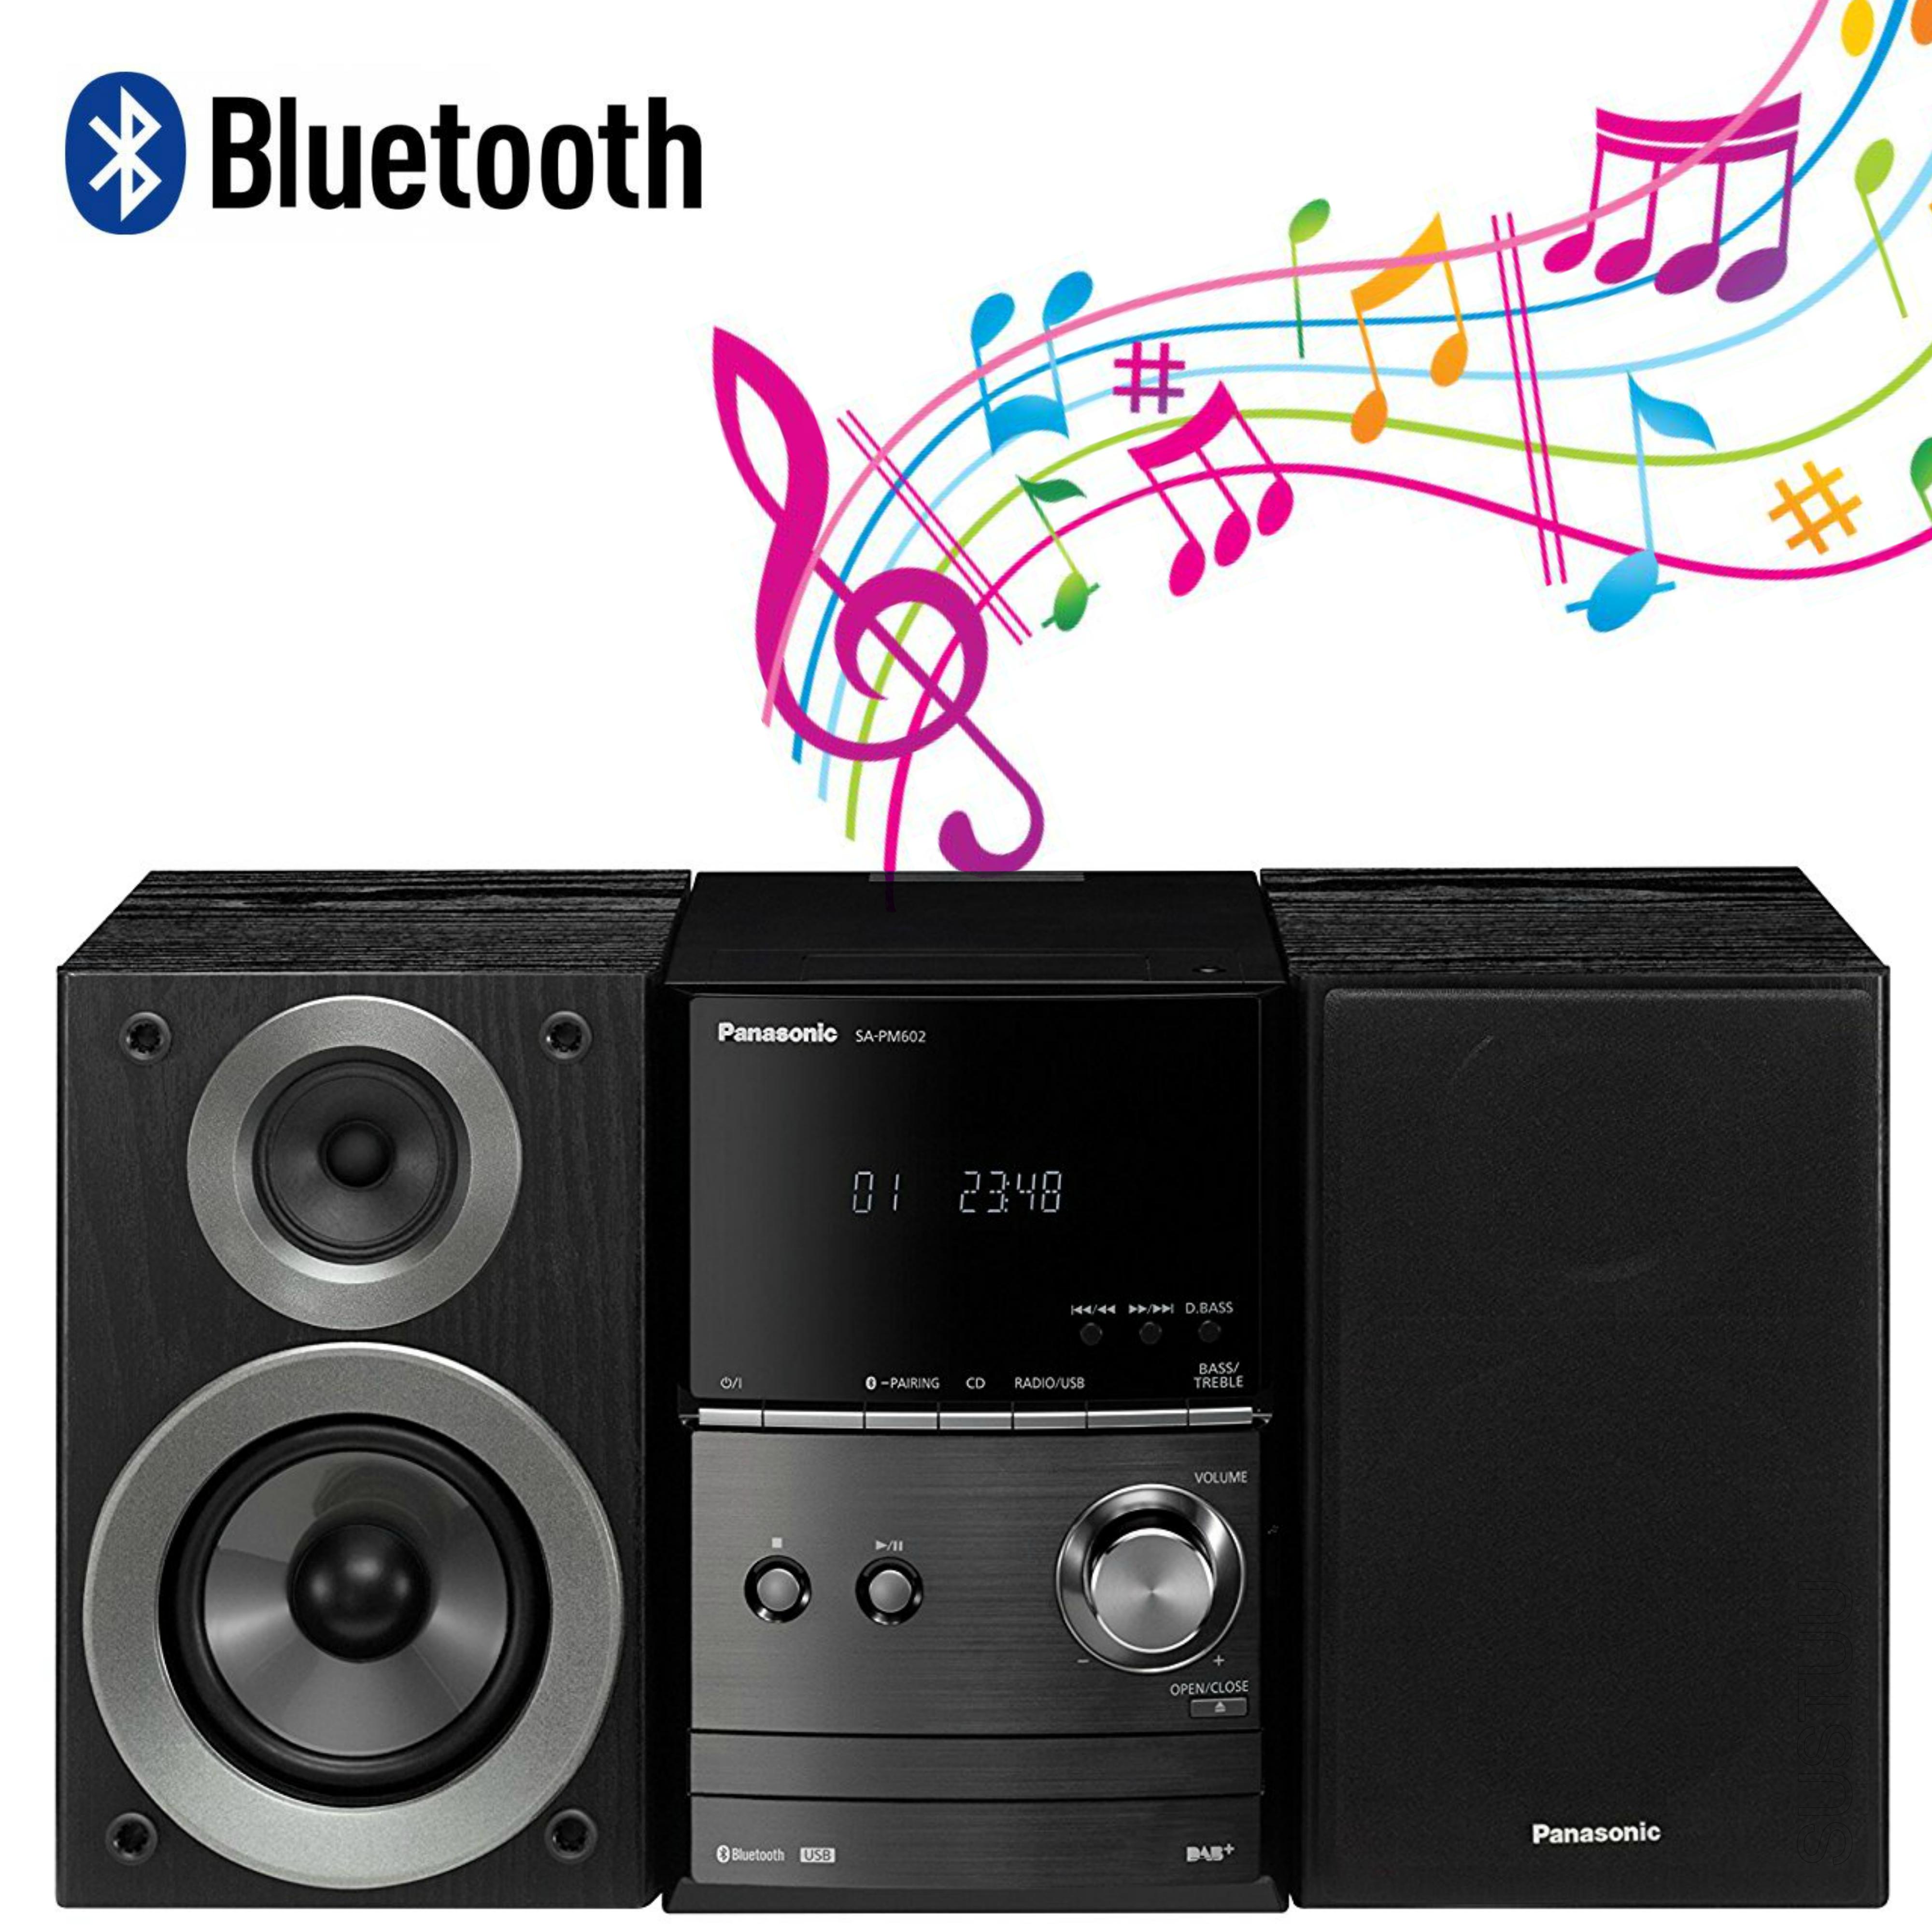 Panasonic SCPM602EBK Bluetooth Micro Hi-FI System-CD/MP3/USB/FM/DAB Radio-Black